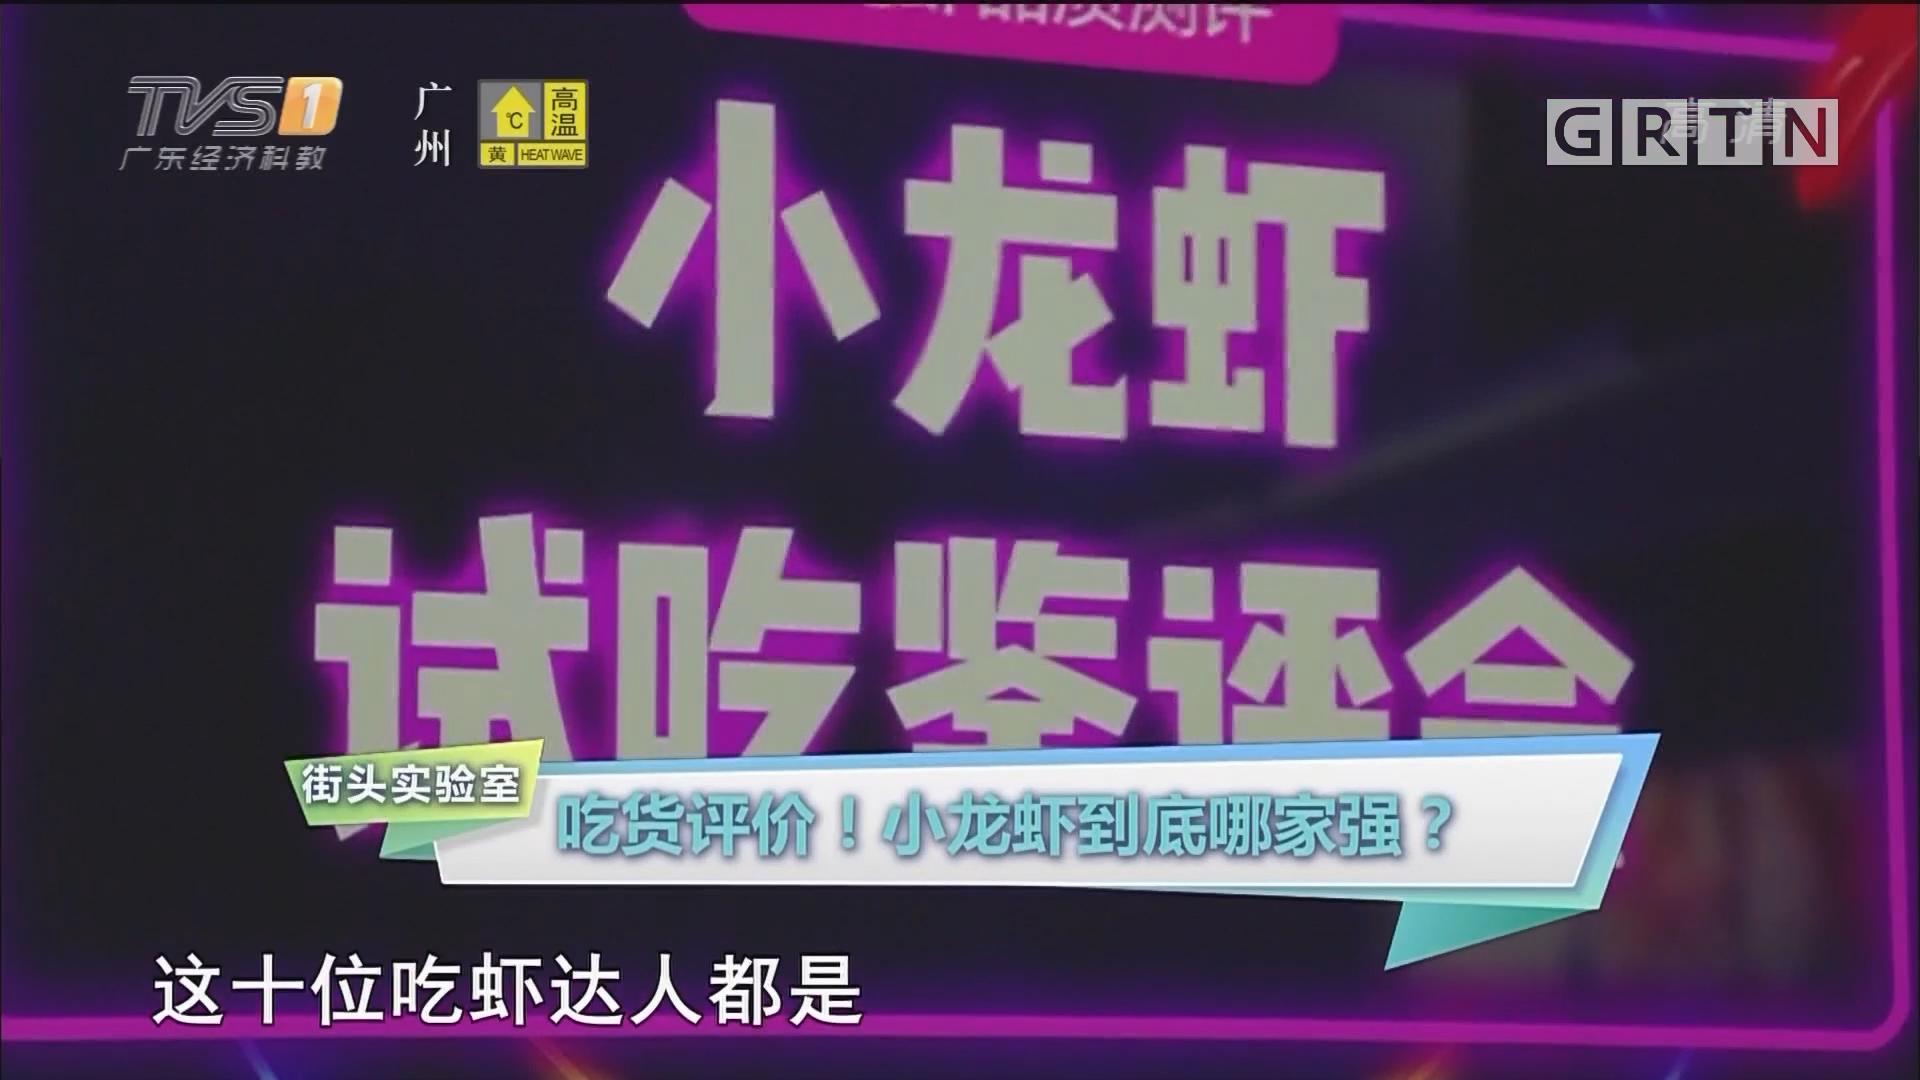 [HD][2019-07-01]马后炮生活+《消费研究院》:街头实验室:吃货评价!小龙虾到底哪家强?